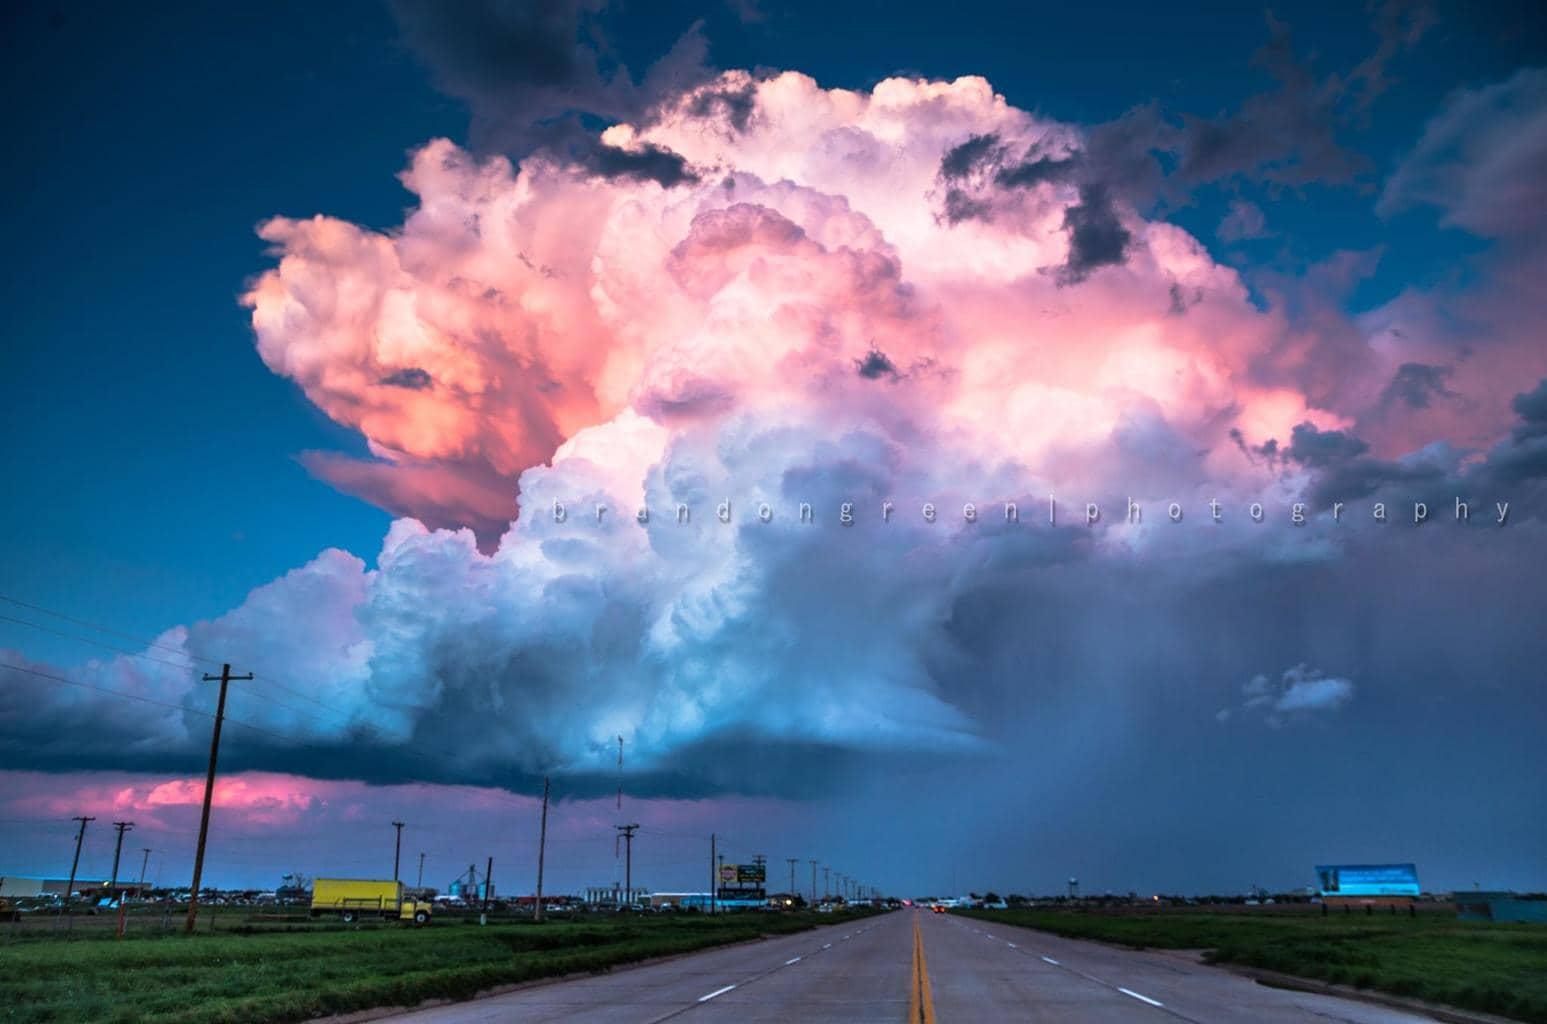 May 6th 2015 in Altus, Ok. Sun setting on evening thunderstorm.